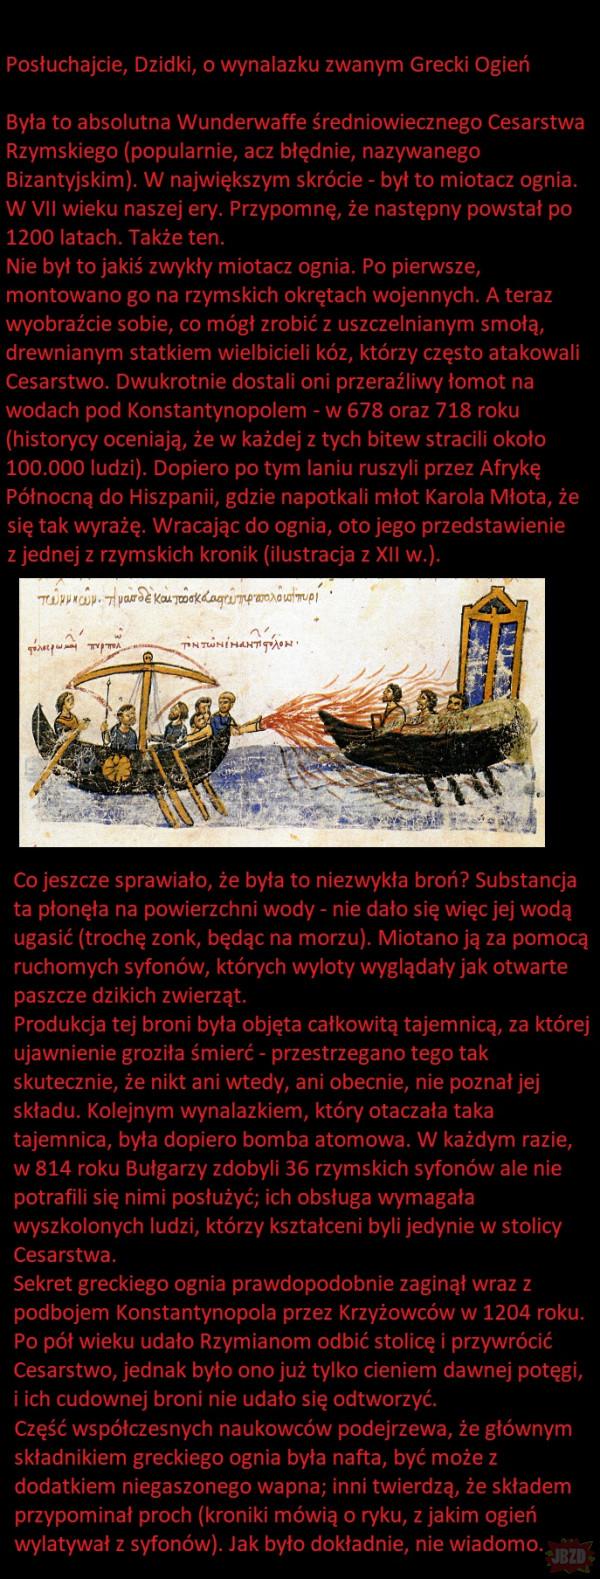 Grecki Ogień